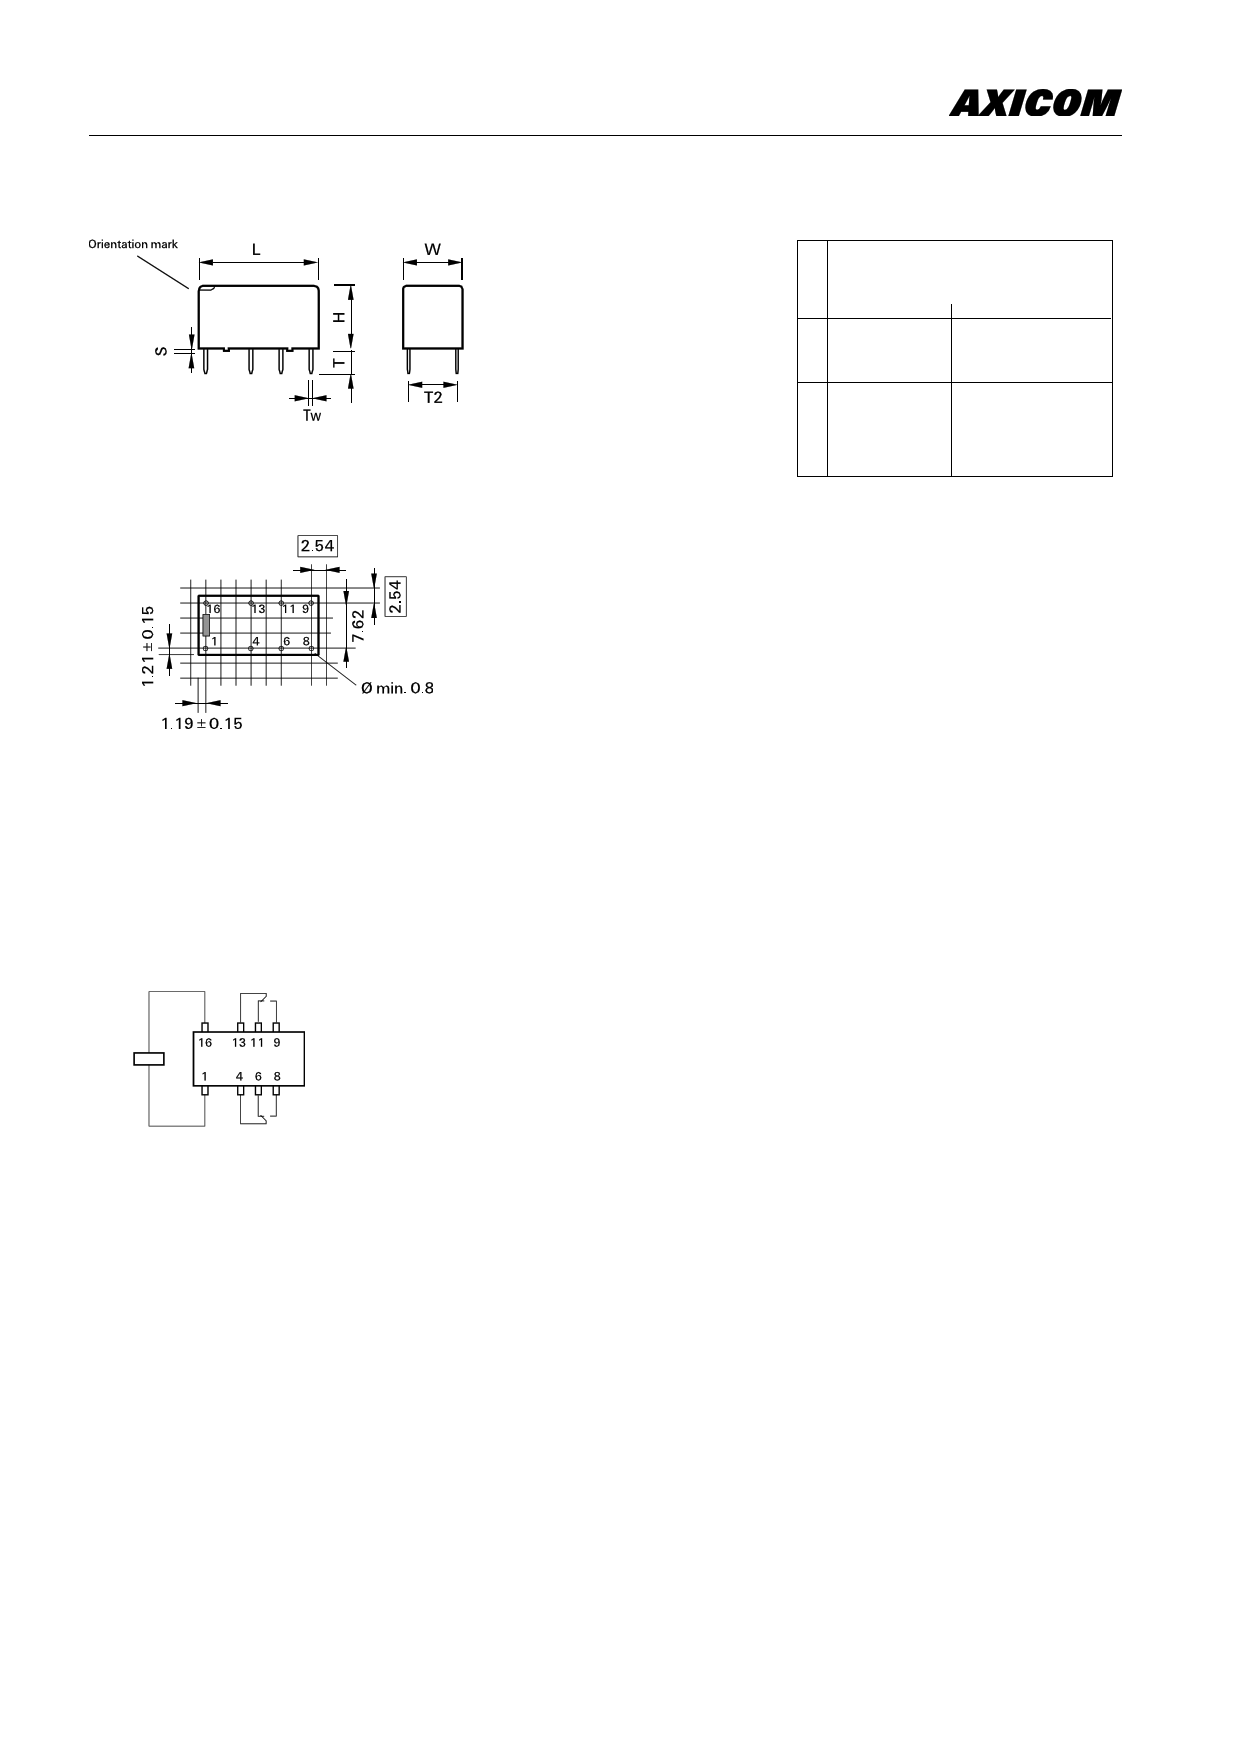 1-1462000-3 Даташит, Описание, Даташиты